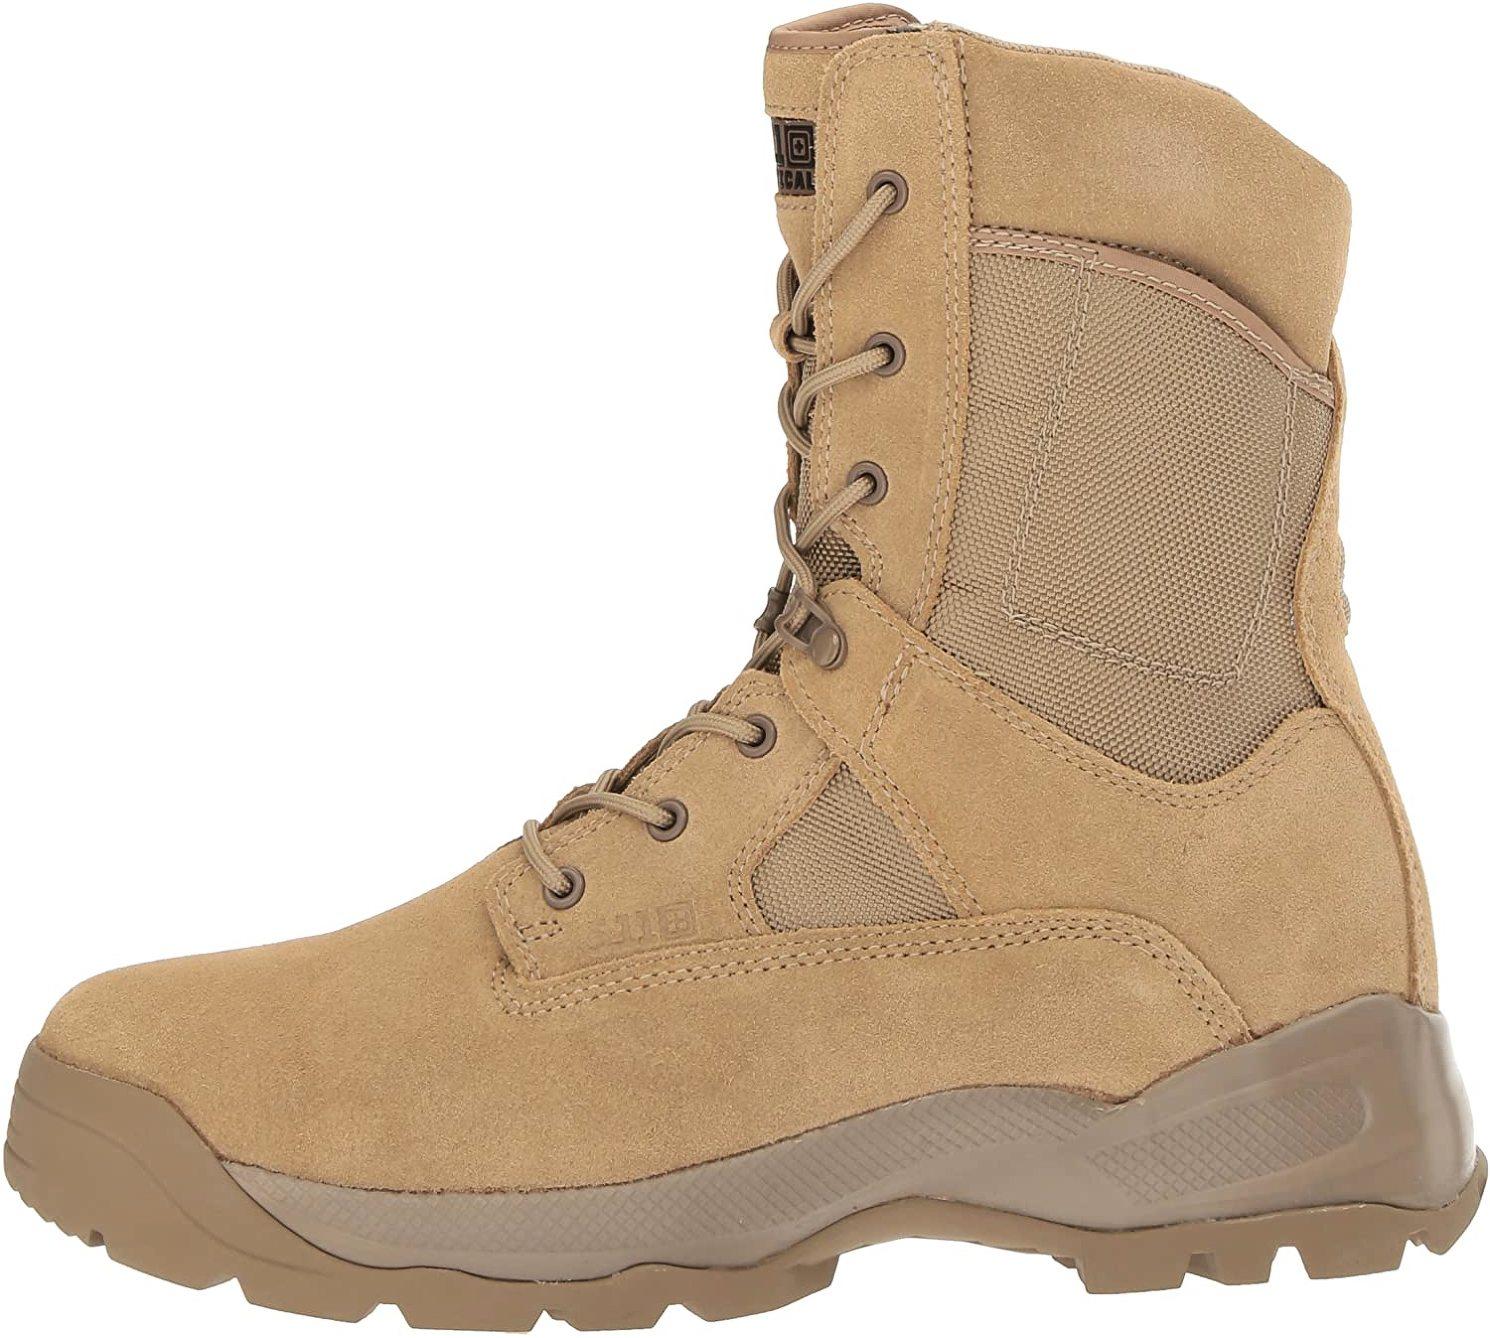 Tactical ATAC Men's Leather Jungle Combat Coyote Boots